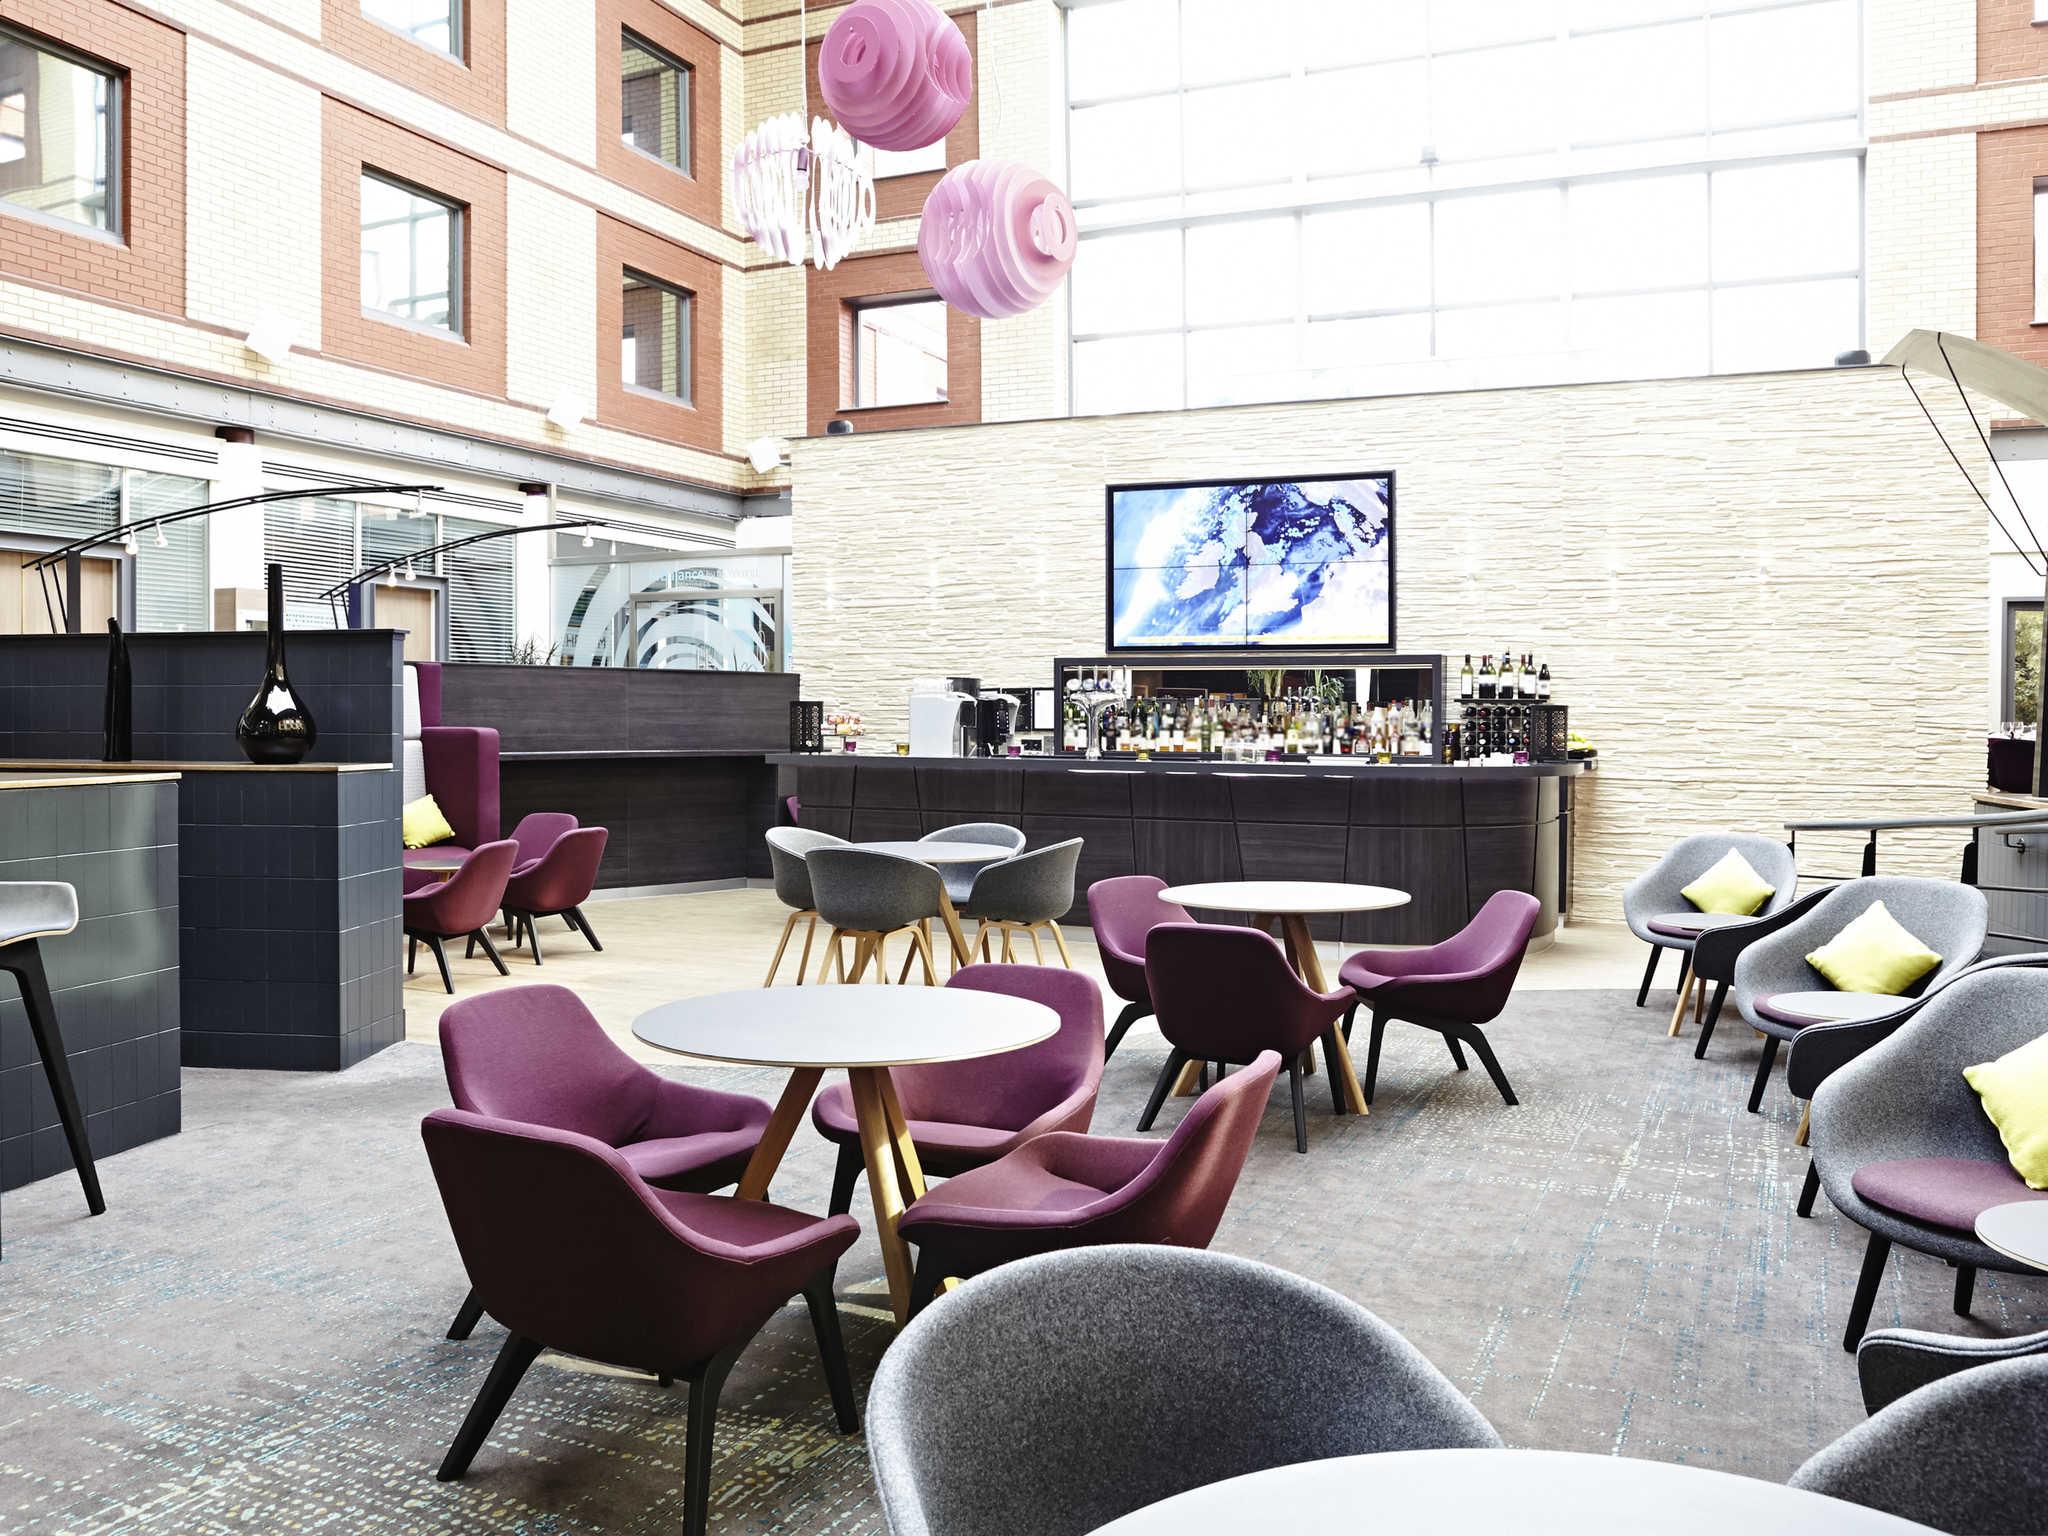 Hotell – Novotel London Heathrow Airport - M4 Jct 4